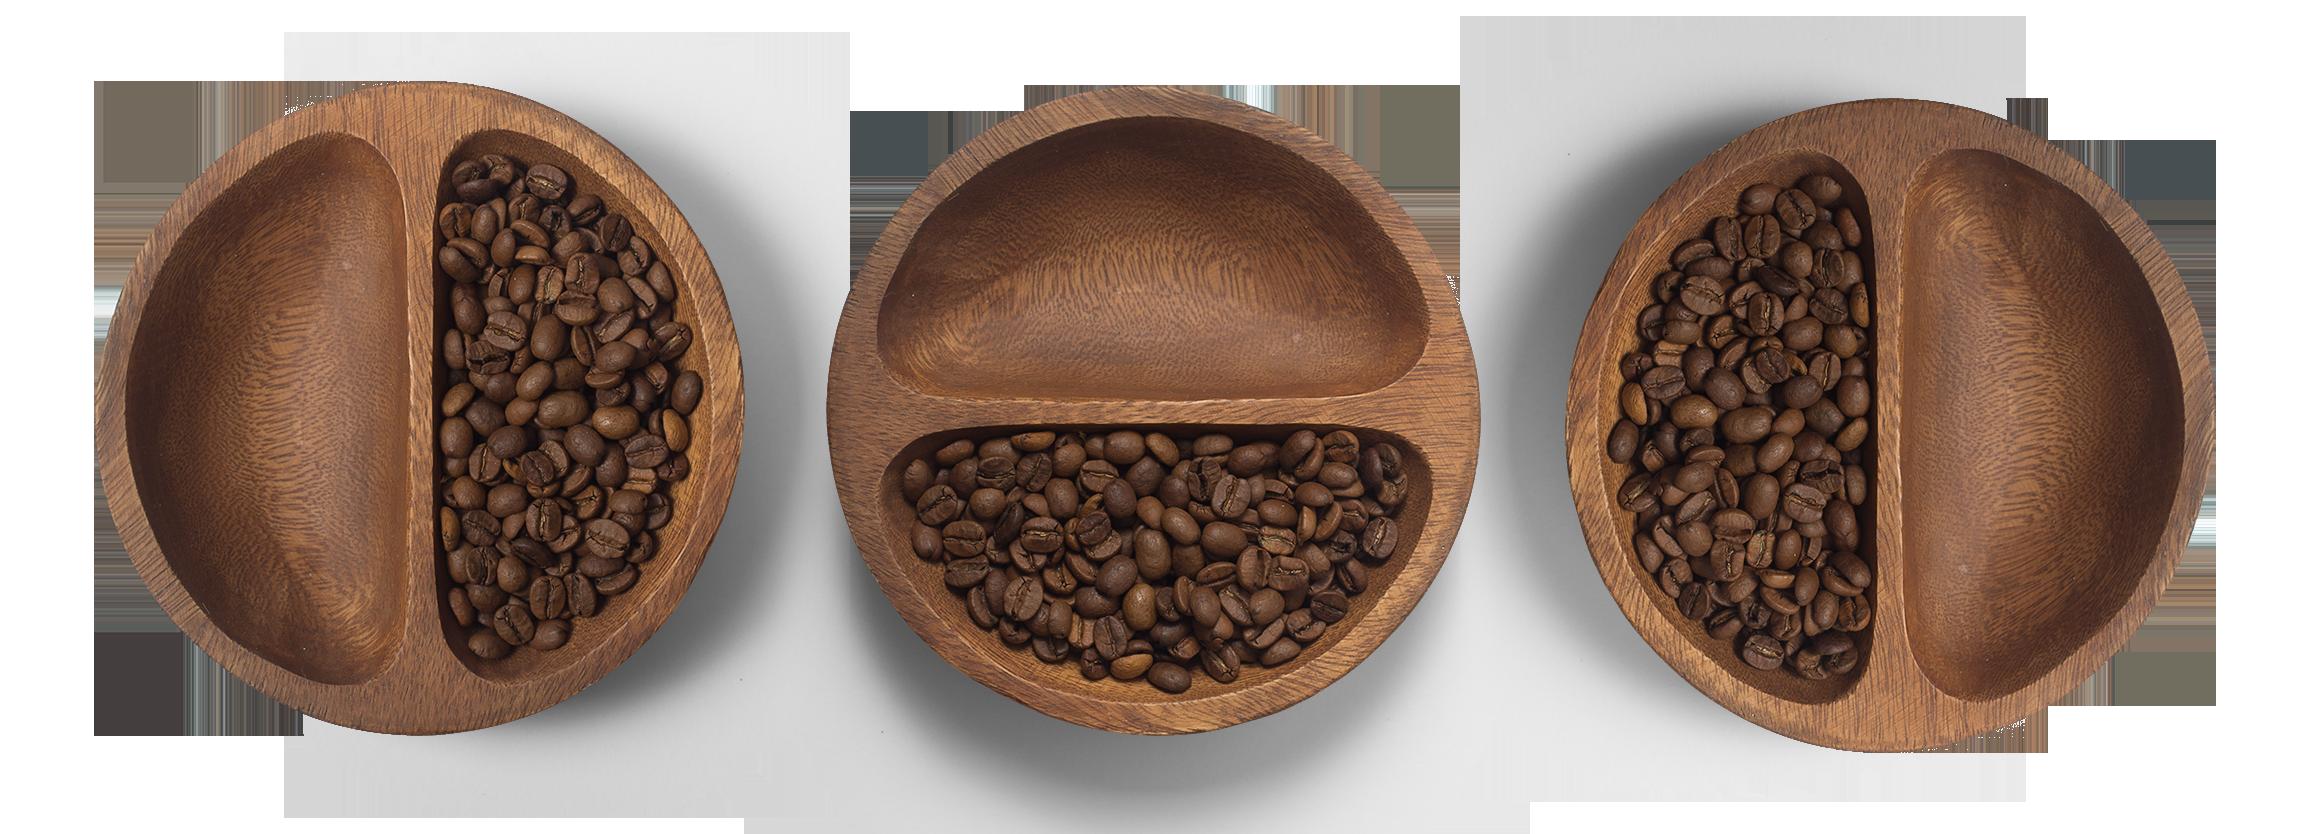 CC_Coffee-Bowl.png